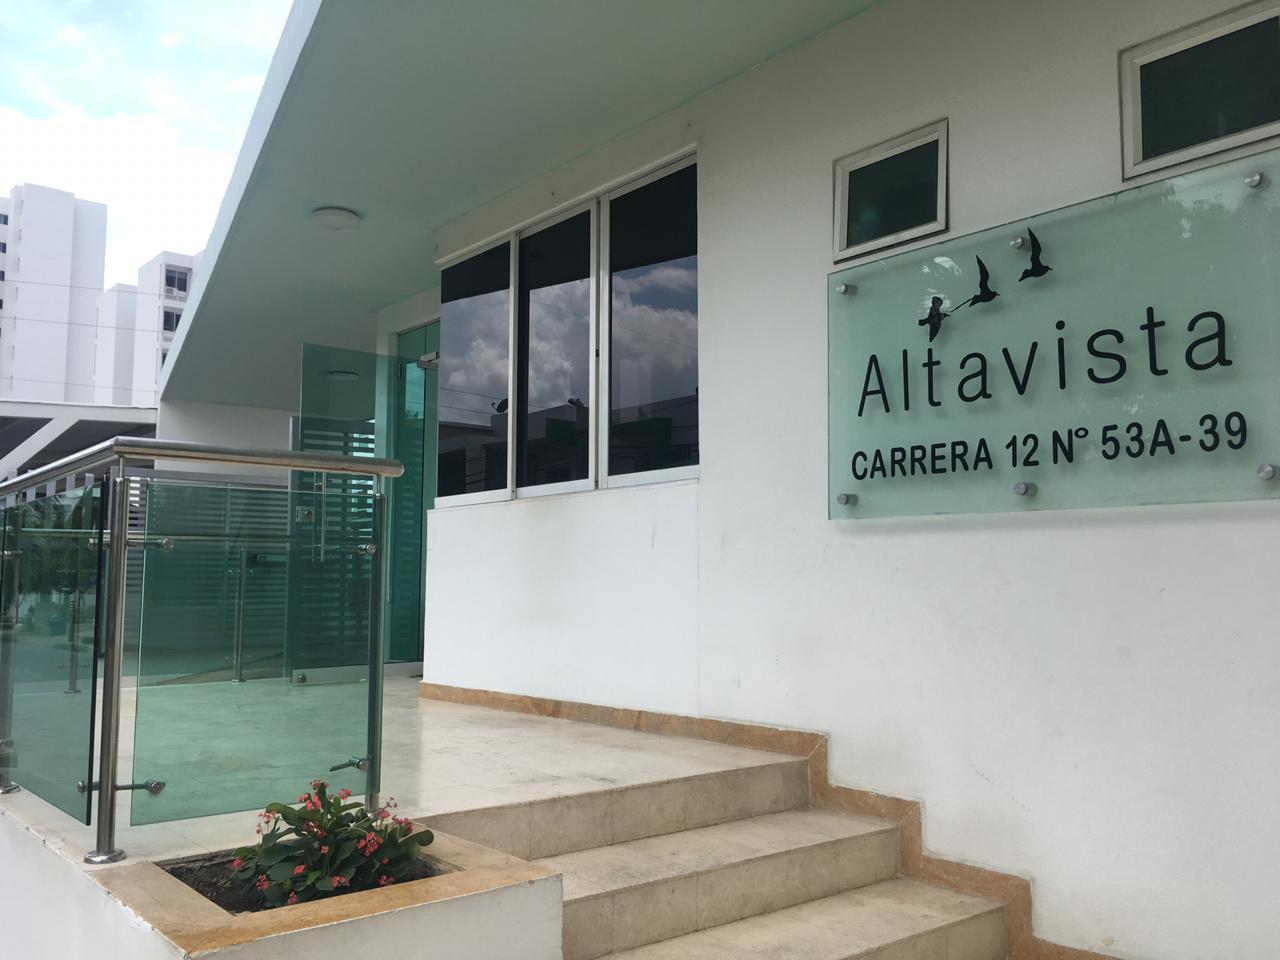 96684 - Apartamento en venta Edificio Altavista